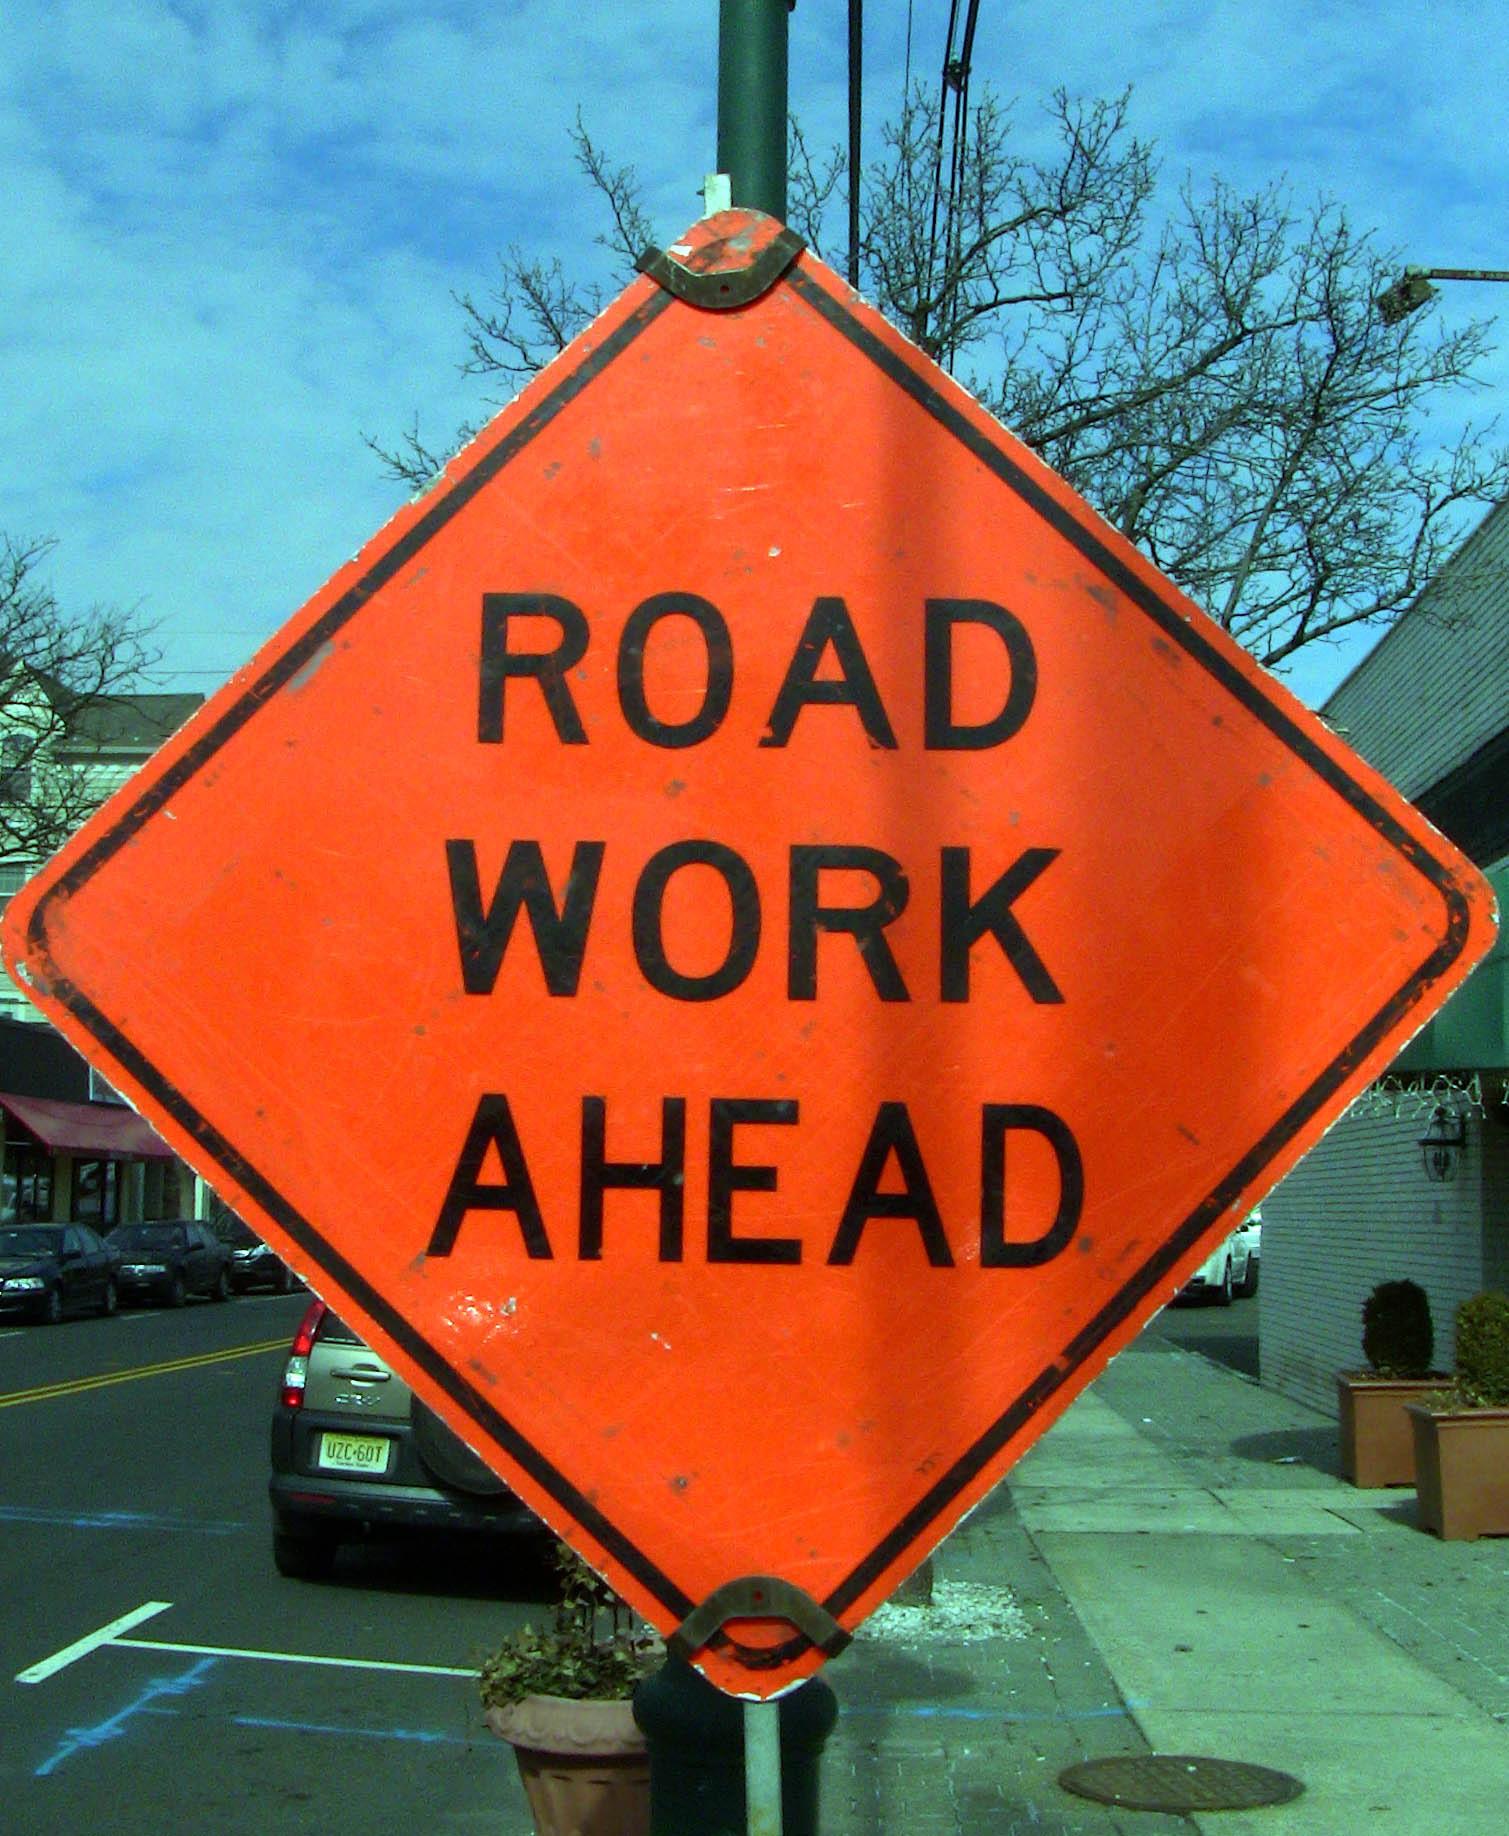 ce82edc380292220a3c5_Road_Work_Ahead_sign.jpg